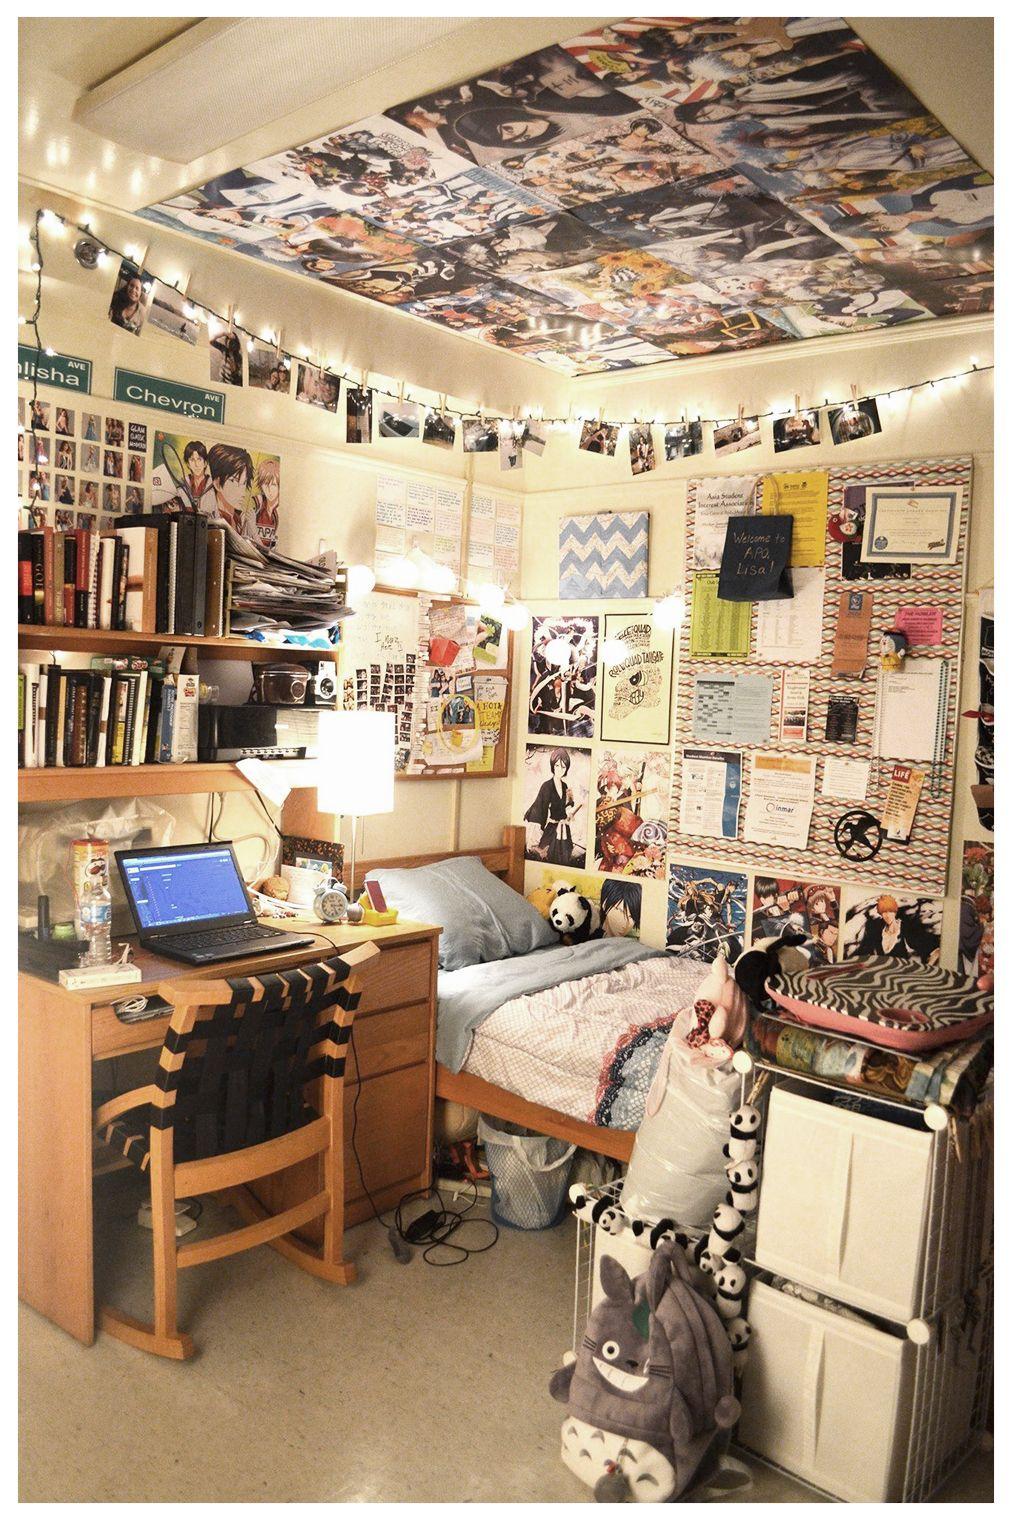 Anime Bedroom Ideas In 2020 20